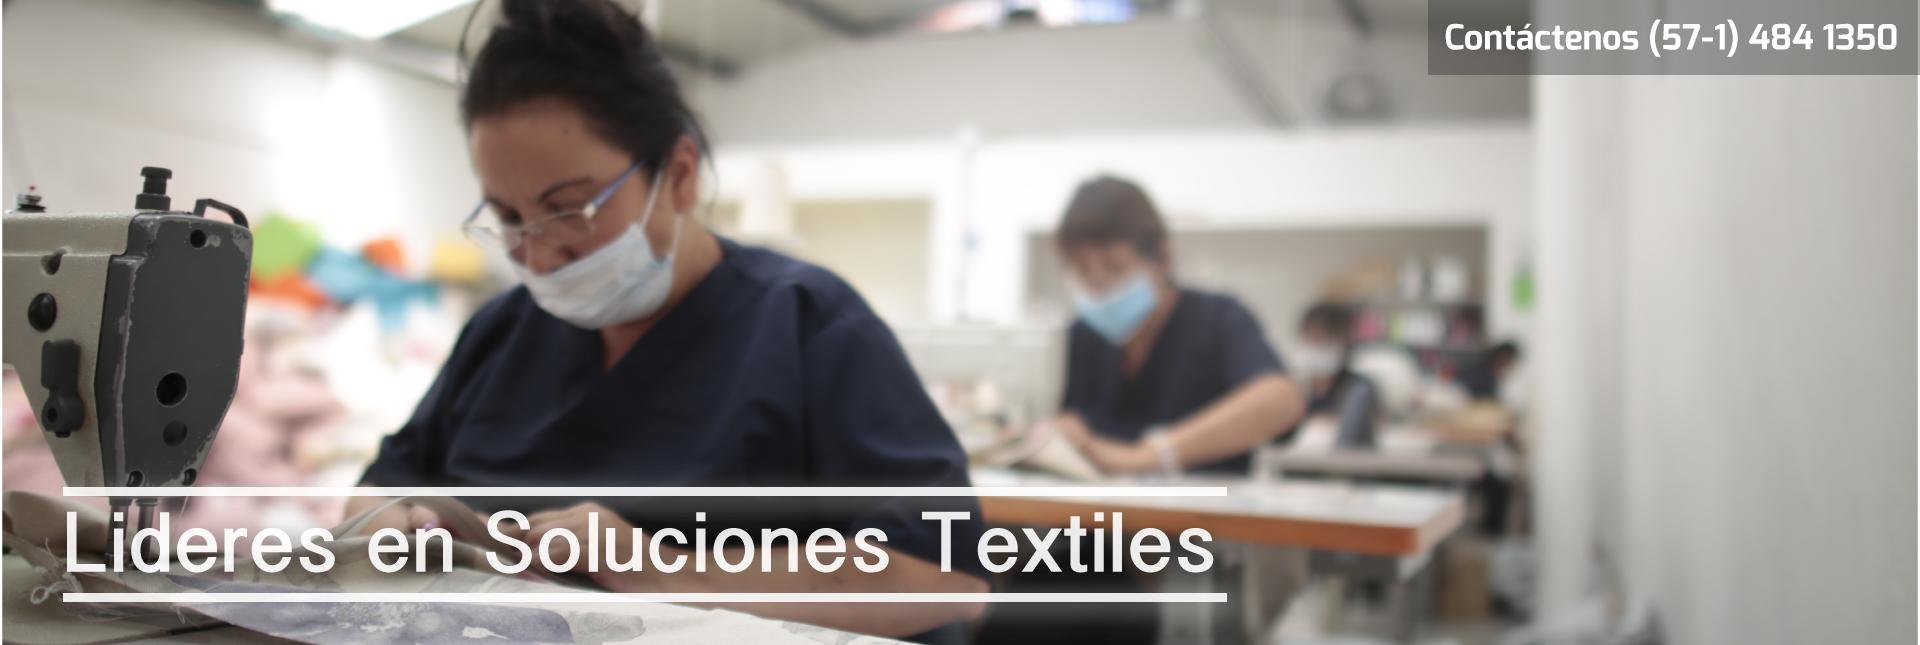 lideres-en-soluciones-textiles-4